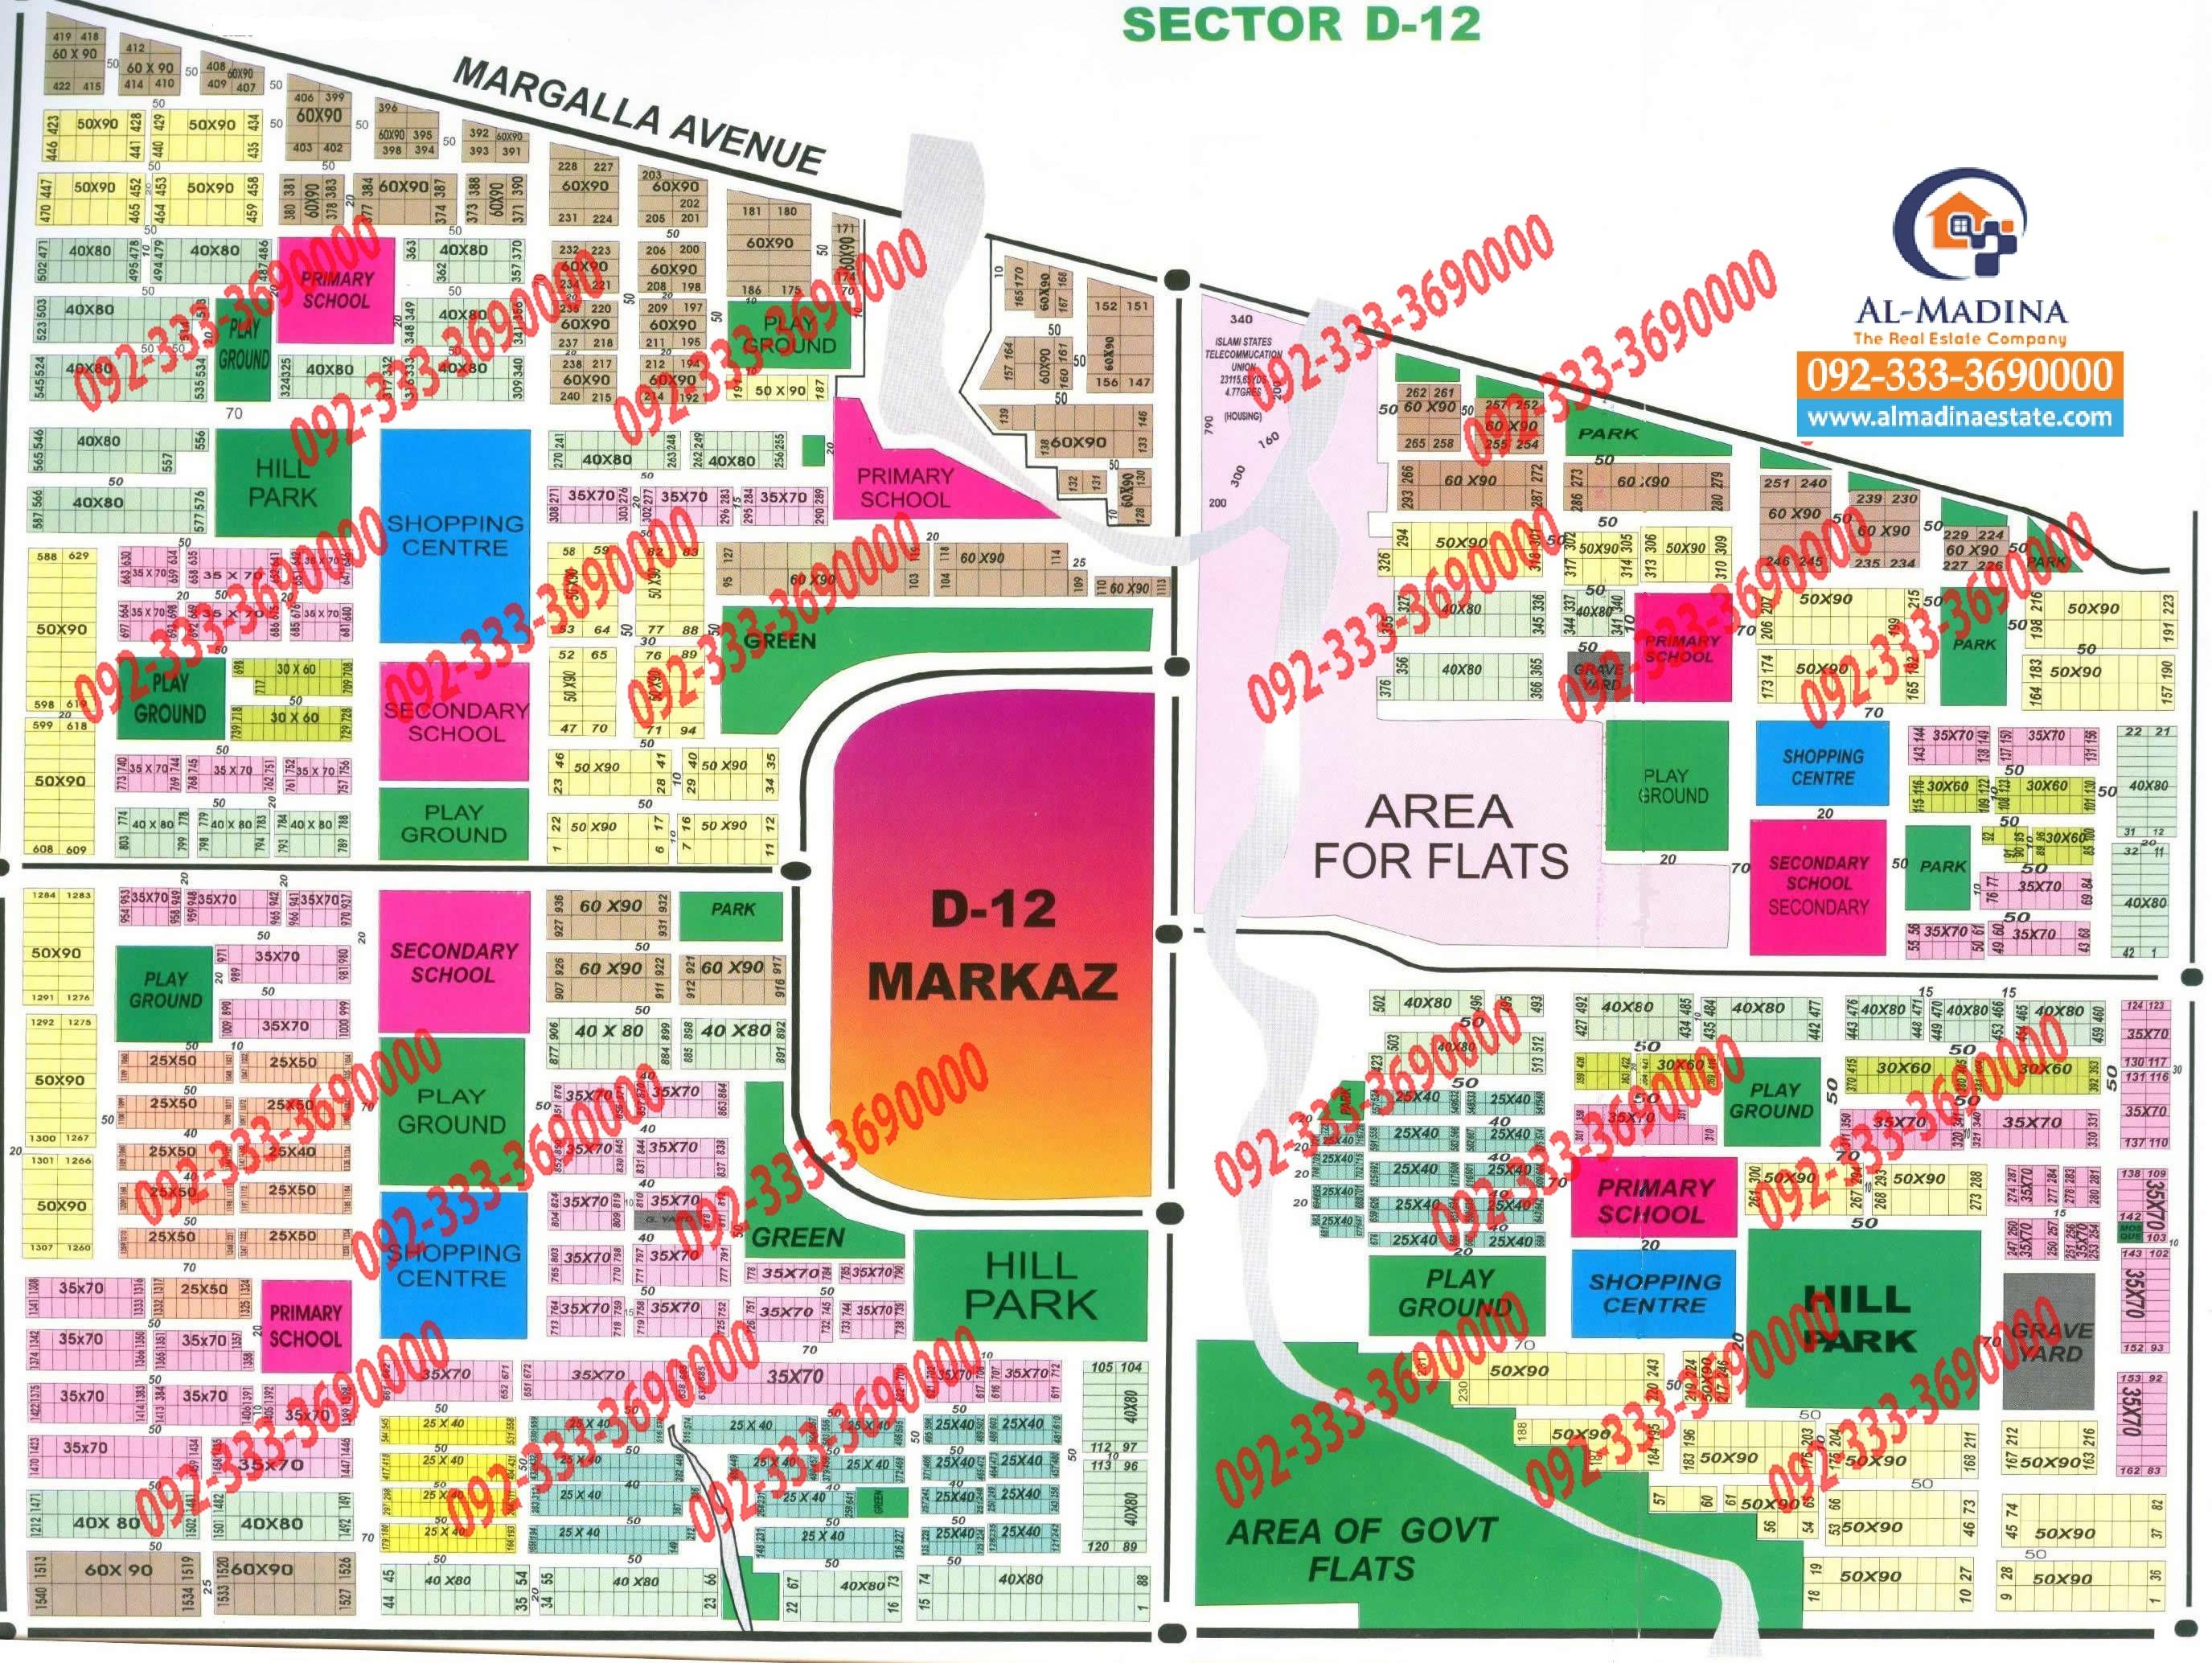 Islamabad maps - Bahria Town l Dha l Gulberg l Cda Sectors